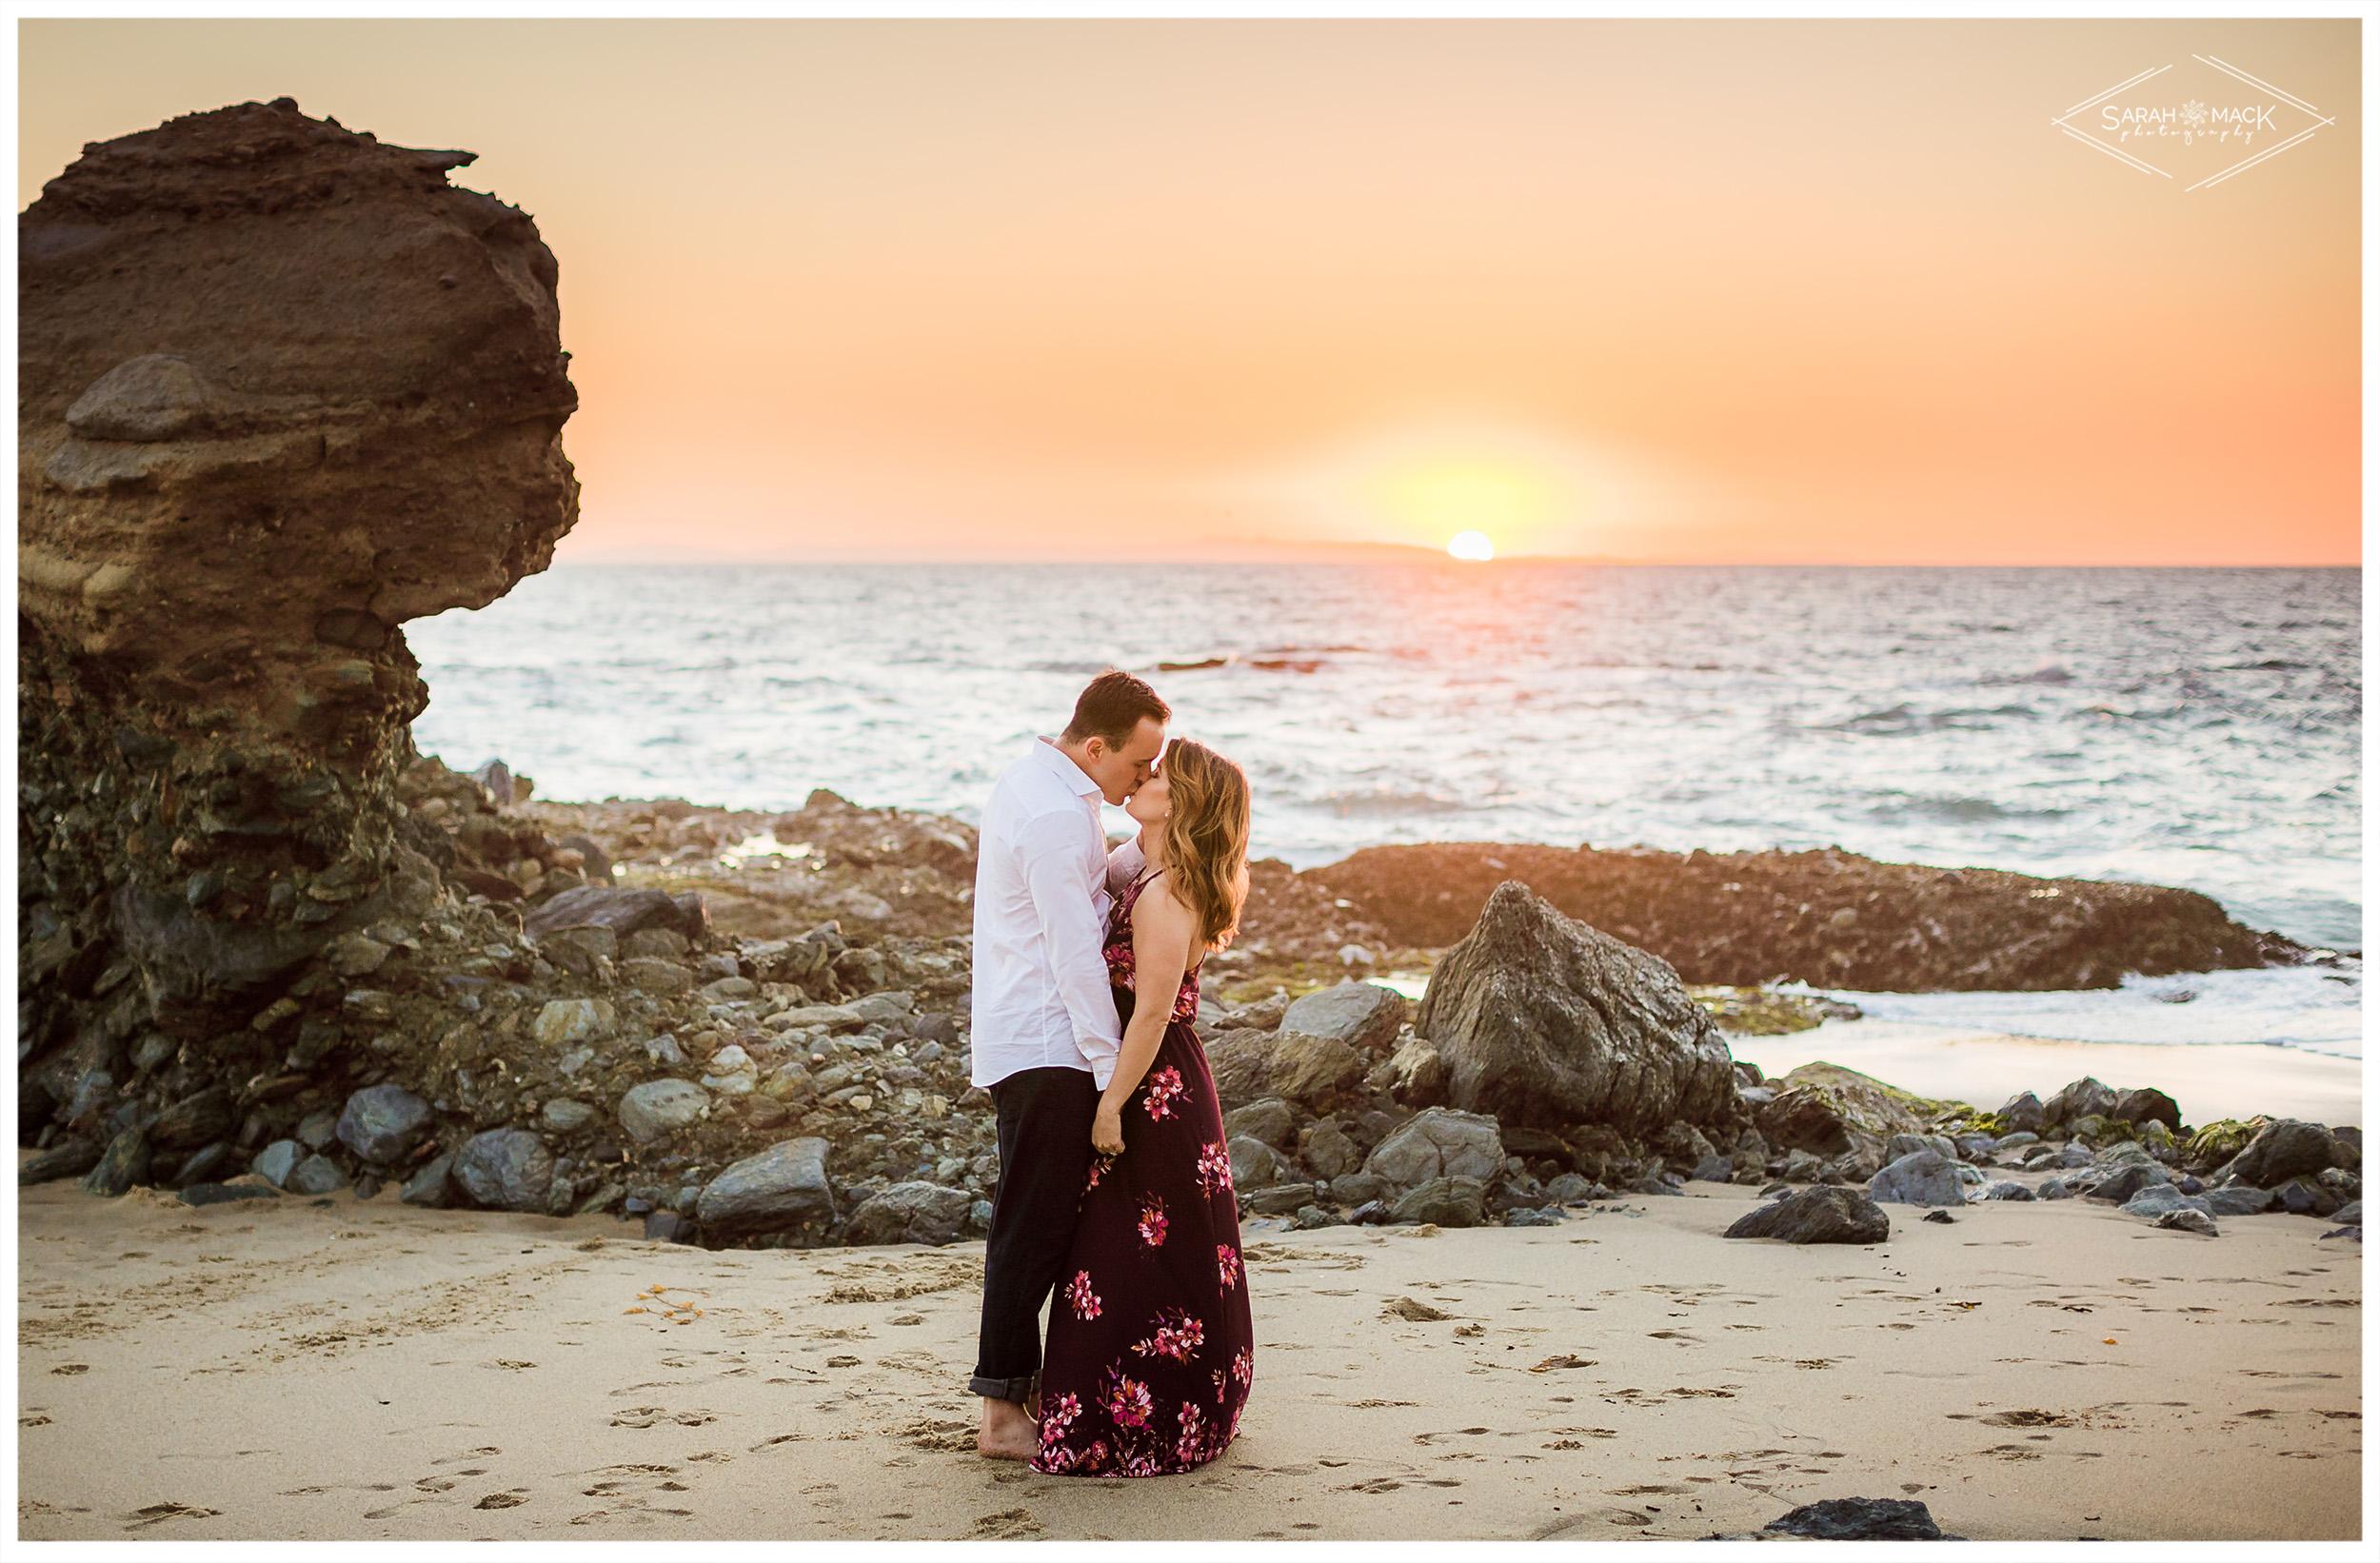 LN-Table-Rock-Beach-Laguna-Engagement-Photography-17.jpg